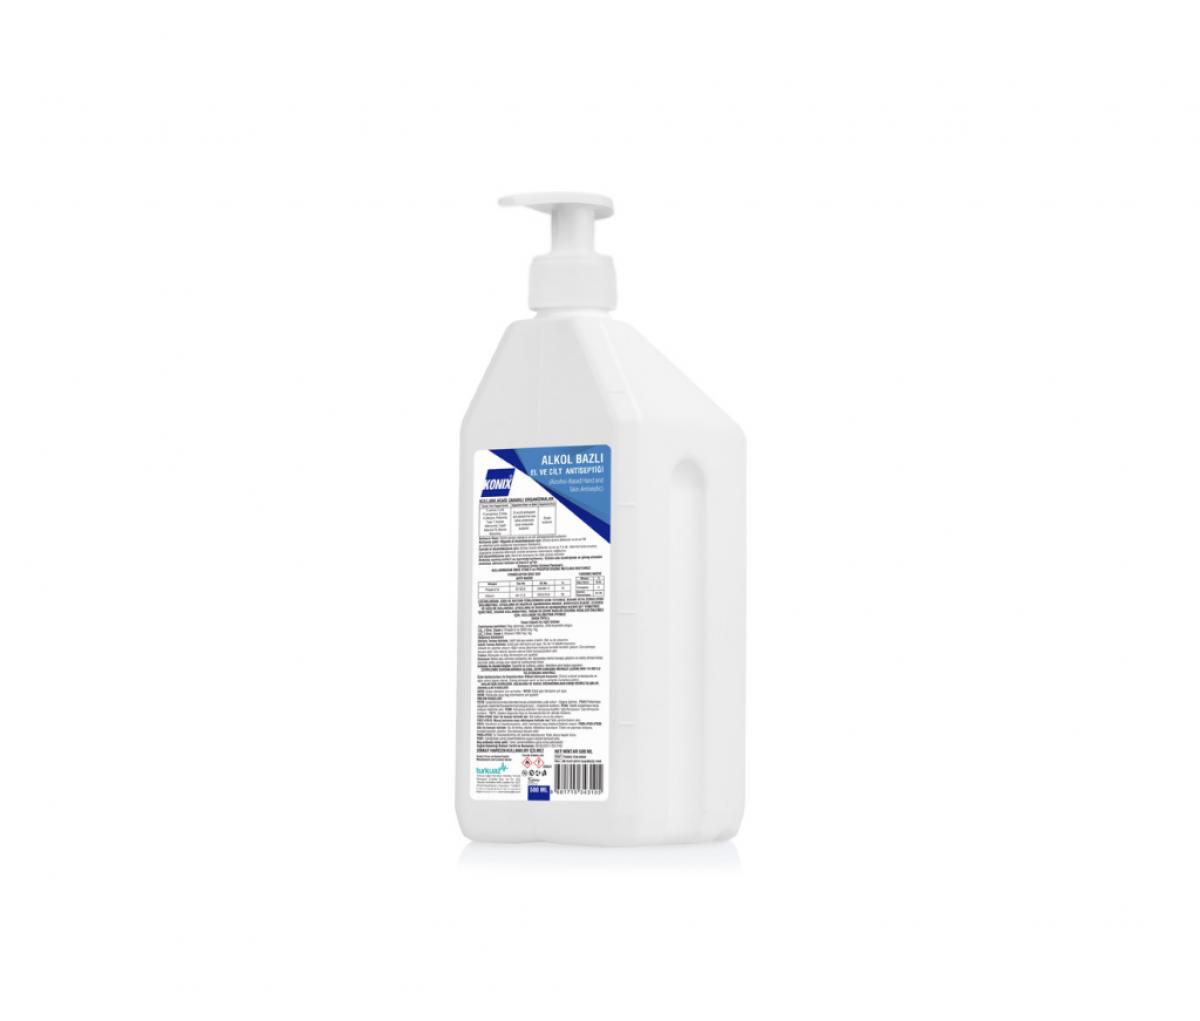 TKZ Konix Hand & Skin Antiseptic Liquid 500ml